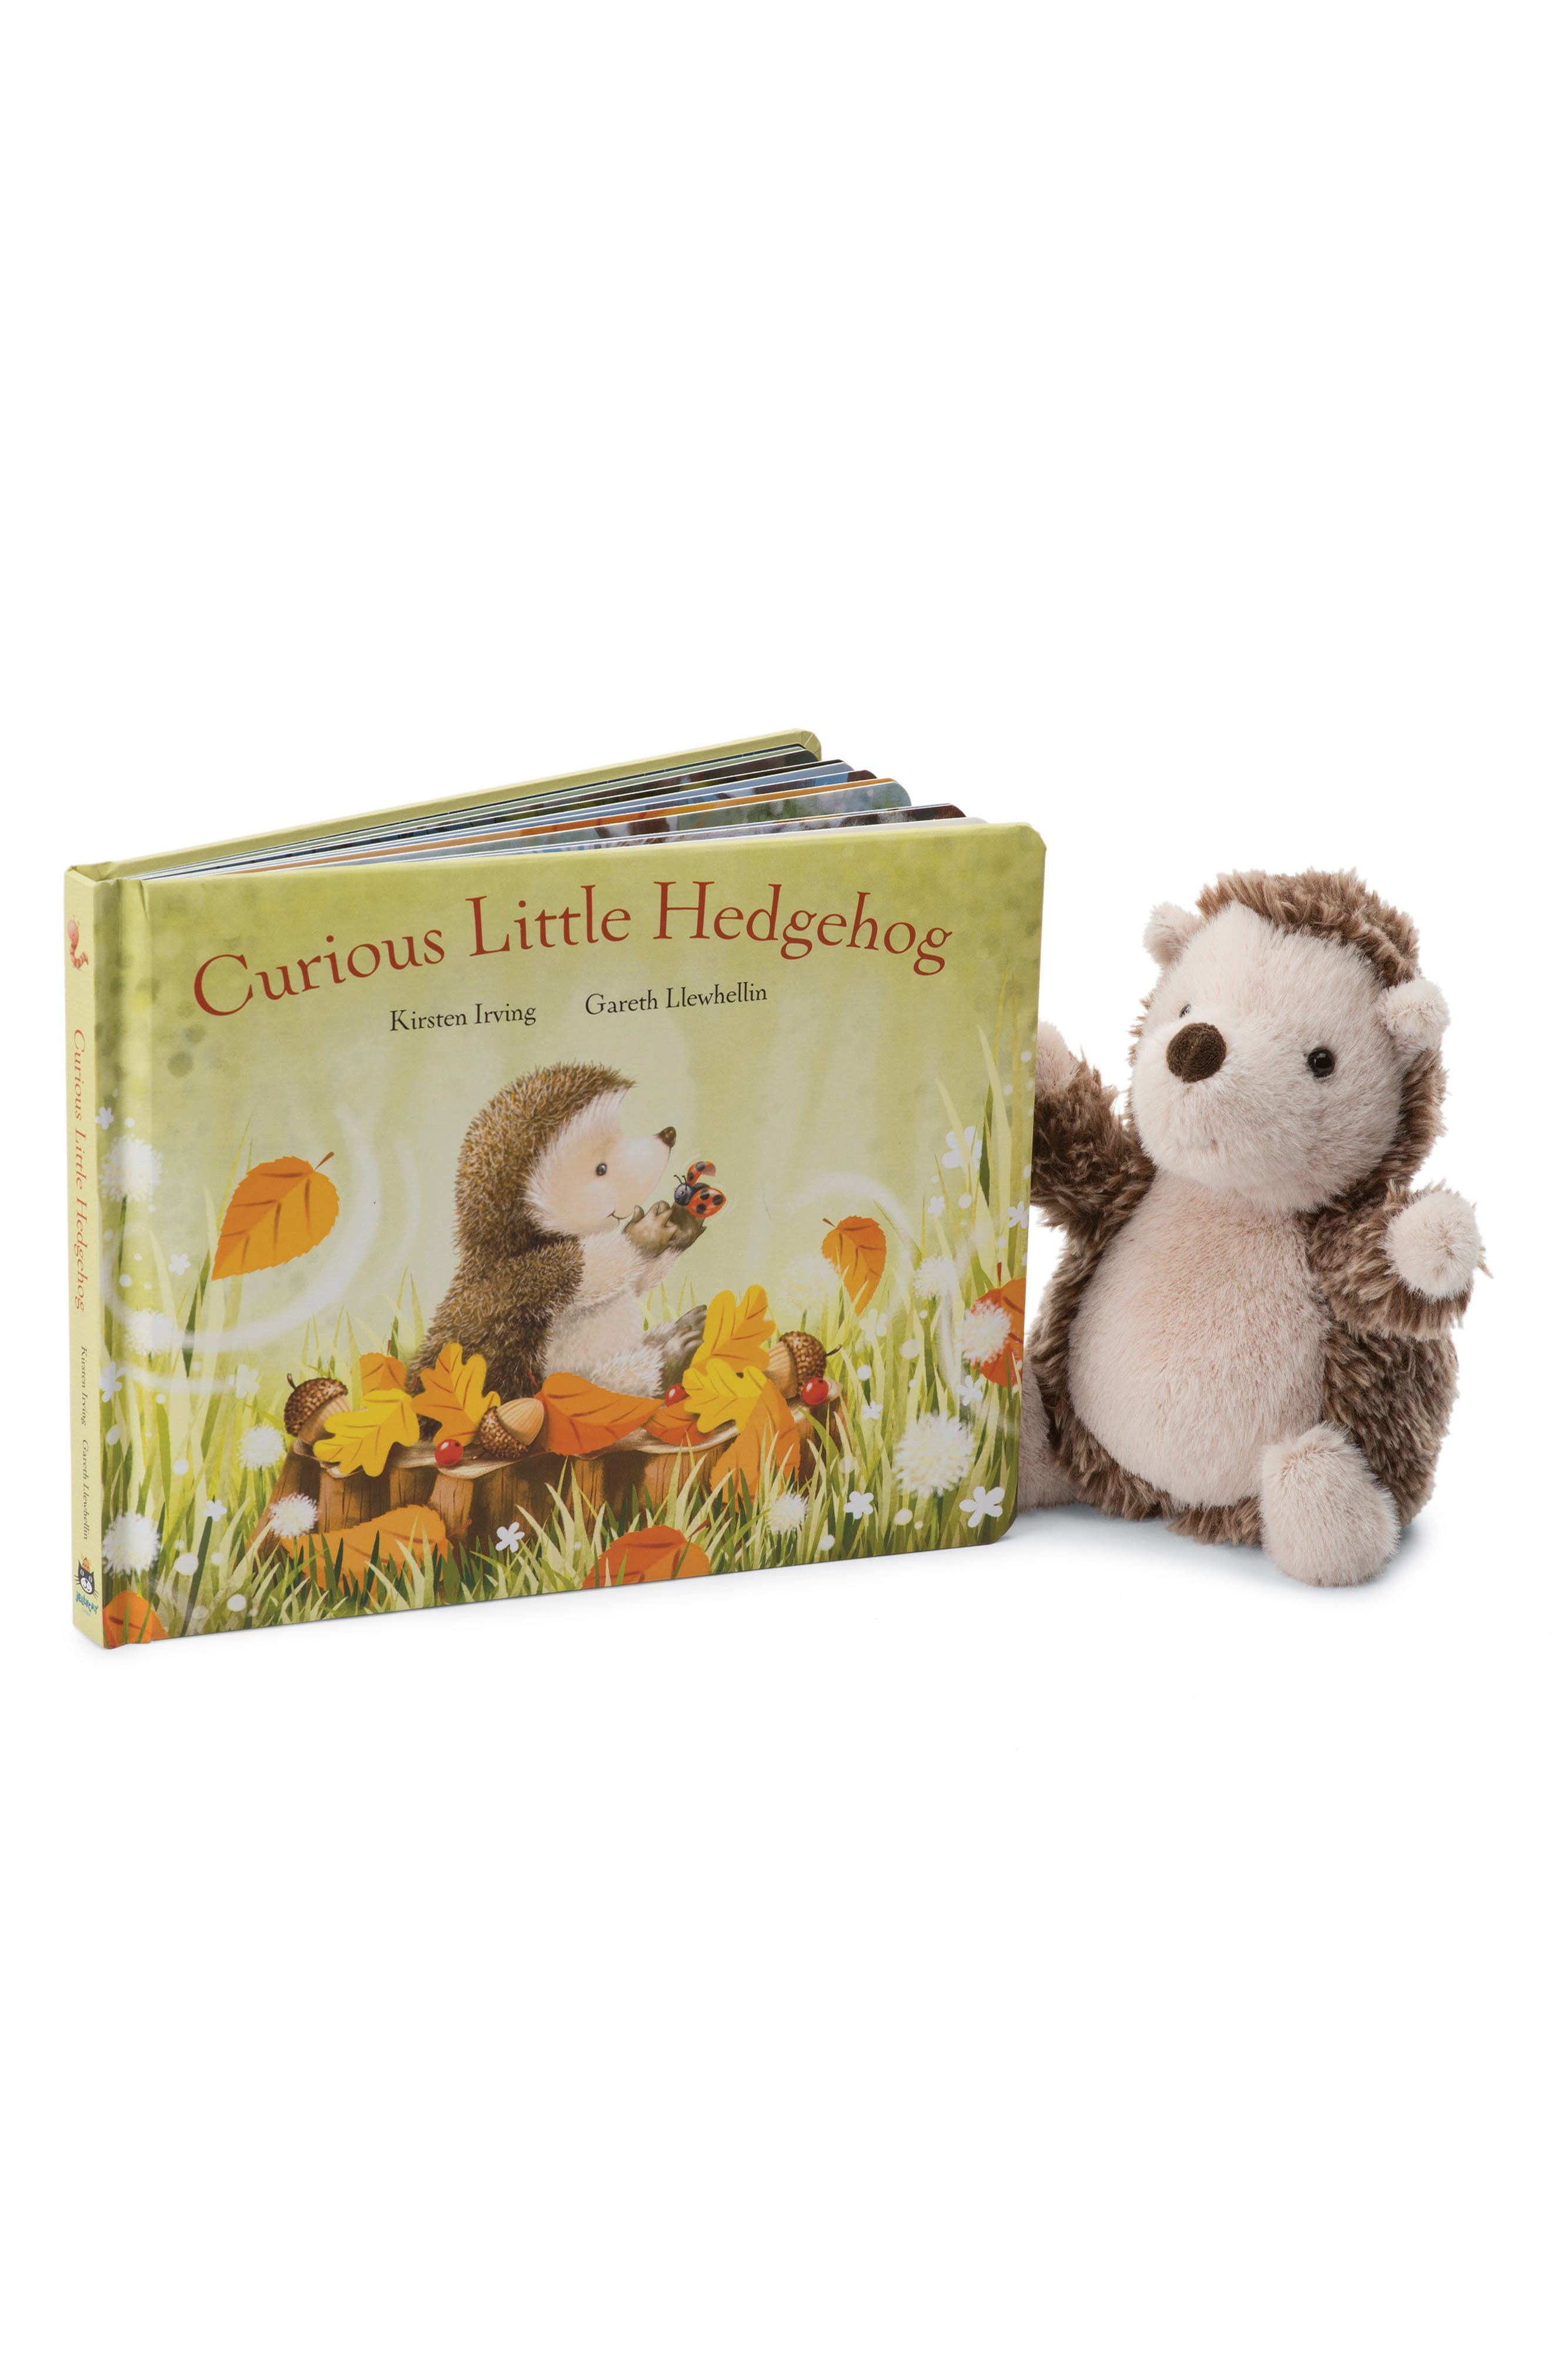 Curious Little Hedgehog Book & Plush Toy,                         Main,                         color, Multi